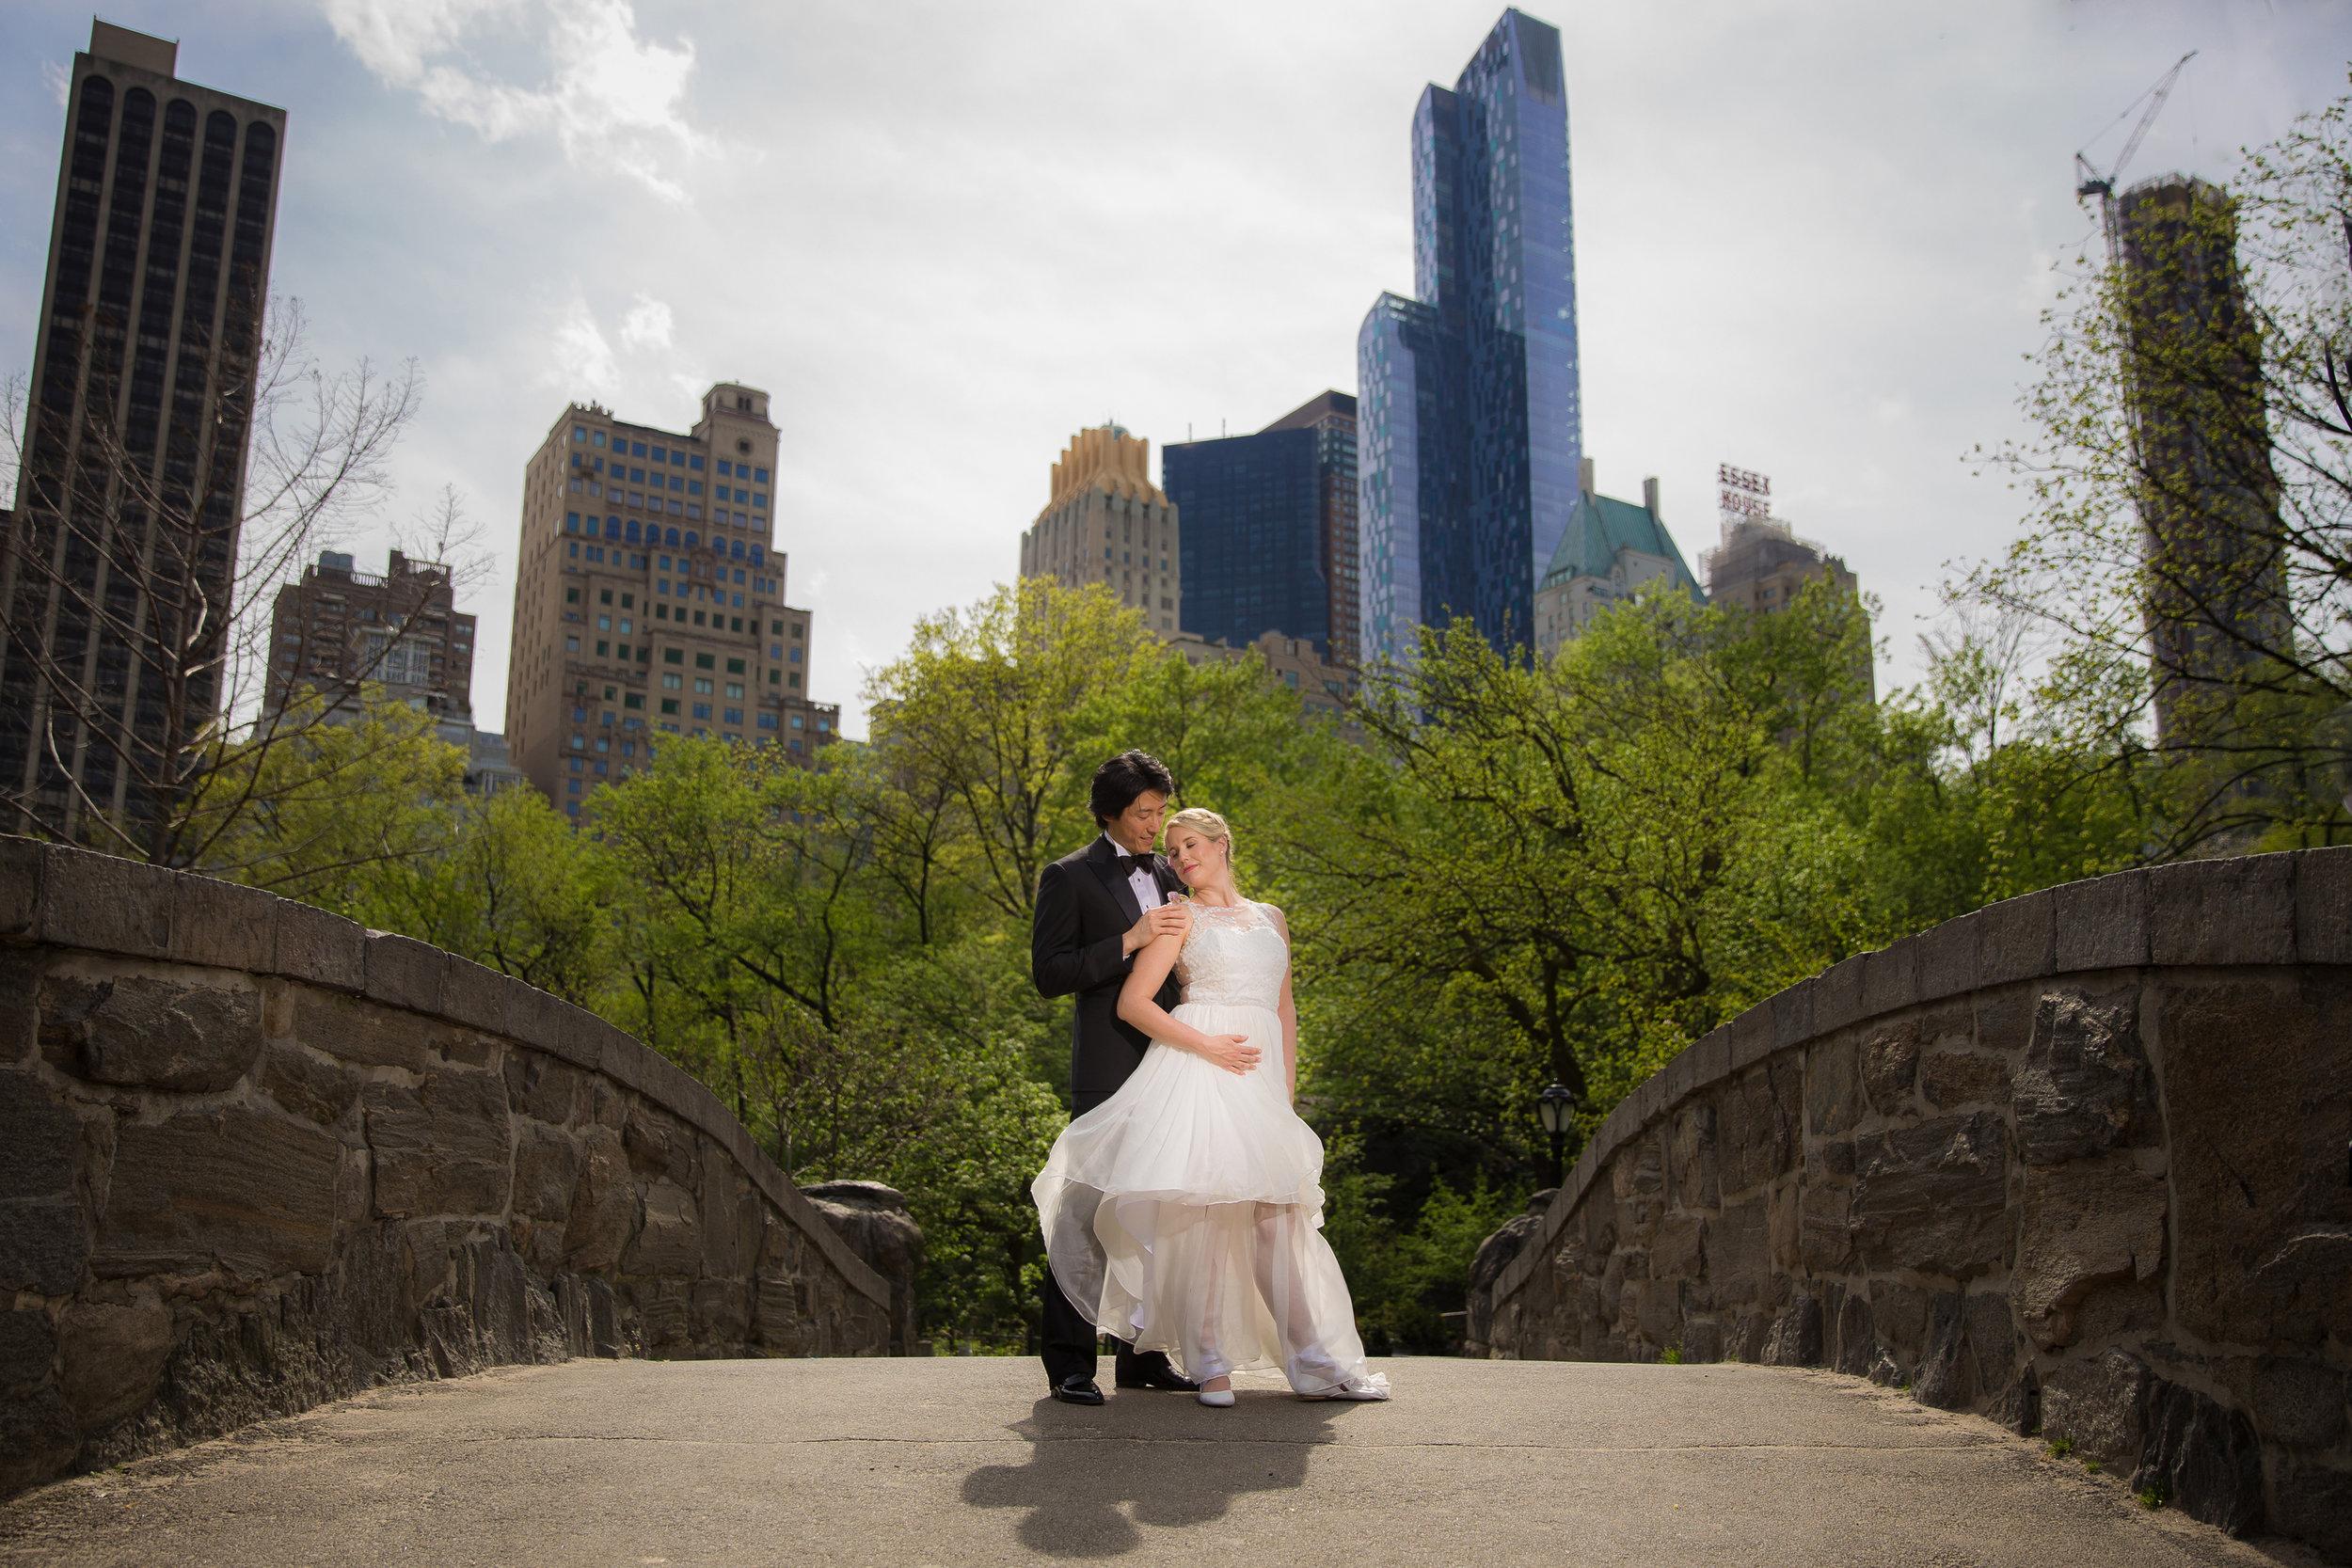 victorious-events-nyc-012-colleen-taka-central-park-zoo-wedding-raymond-hamlin.jpg